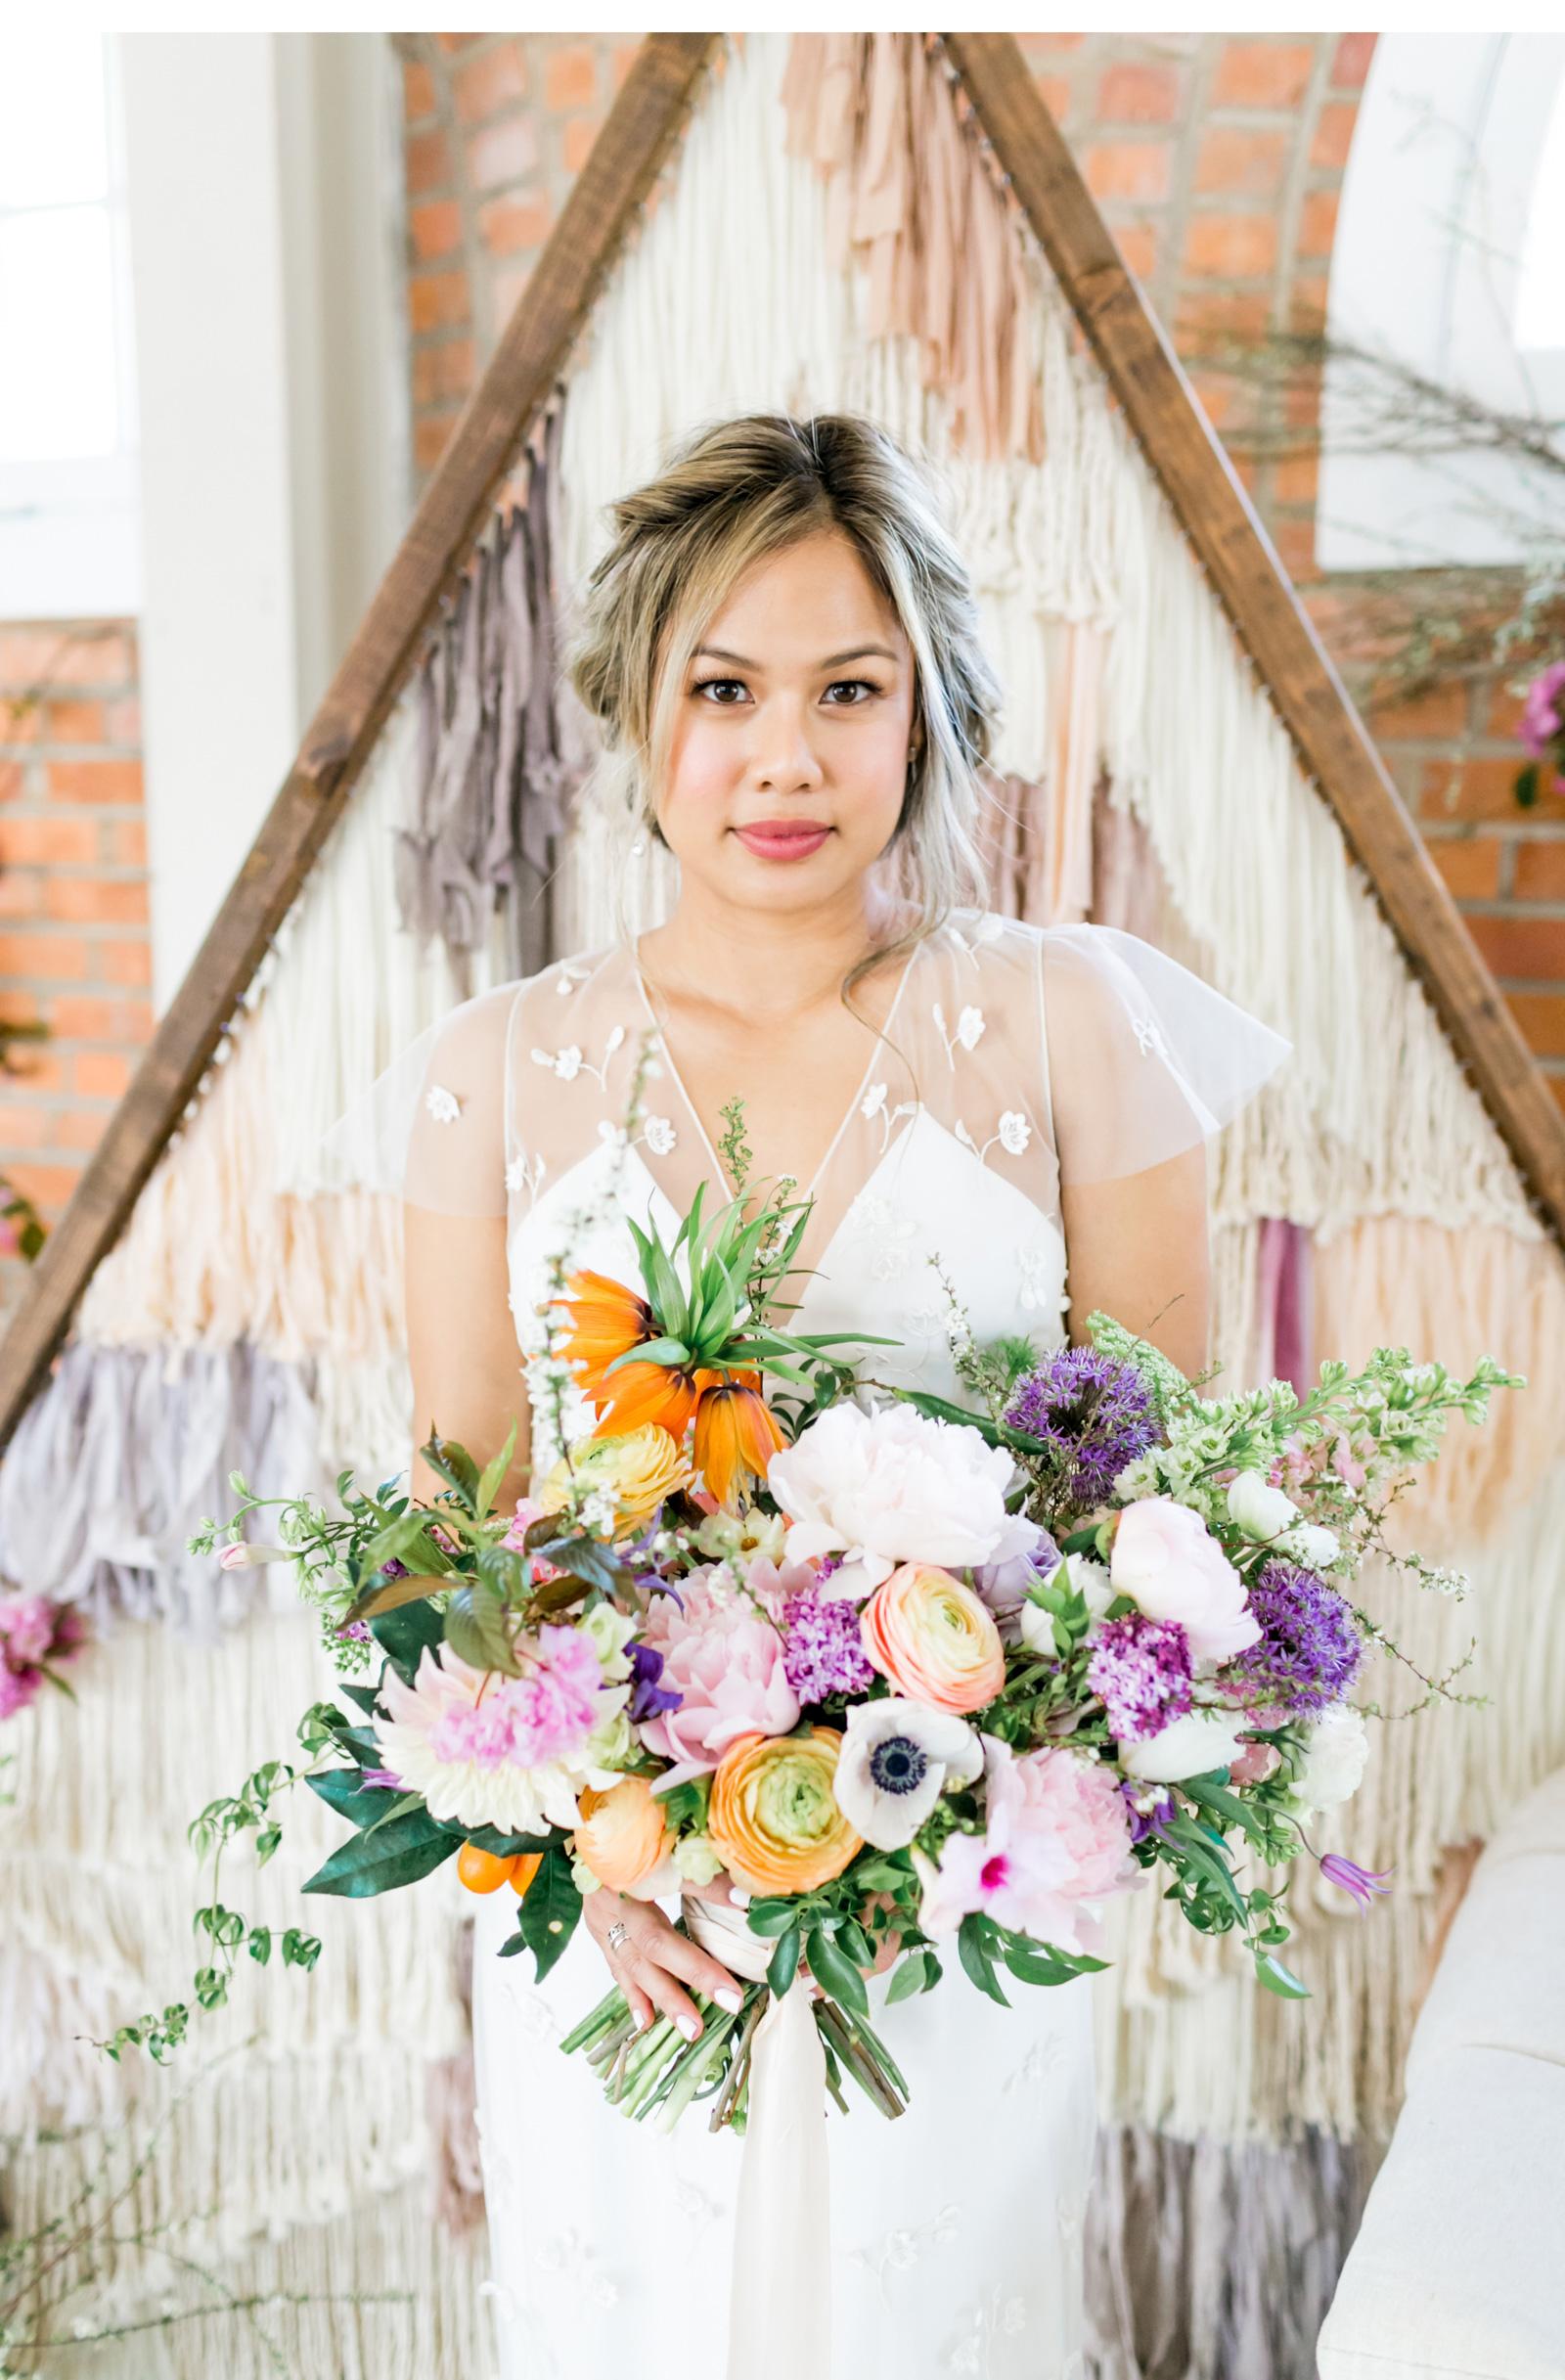 Malibu-Weddings-Natalie-Schutt-Photography-Style-me-Pretty_12.jpg